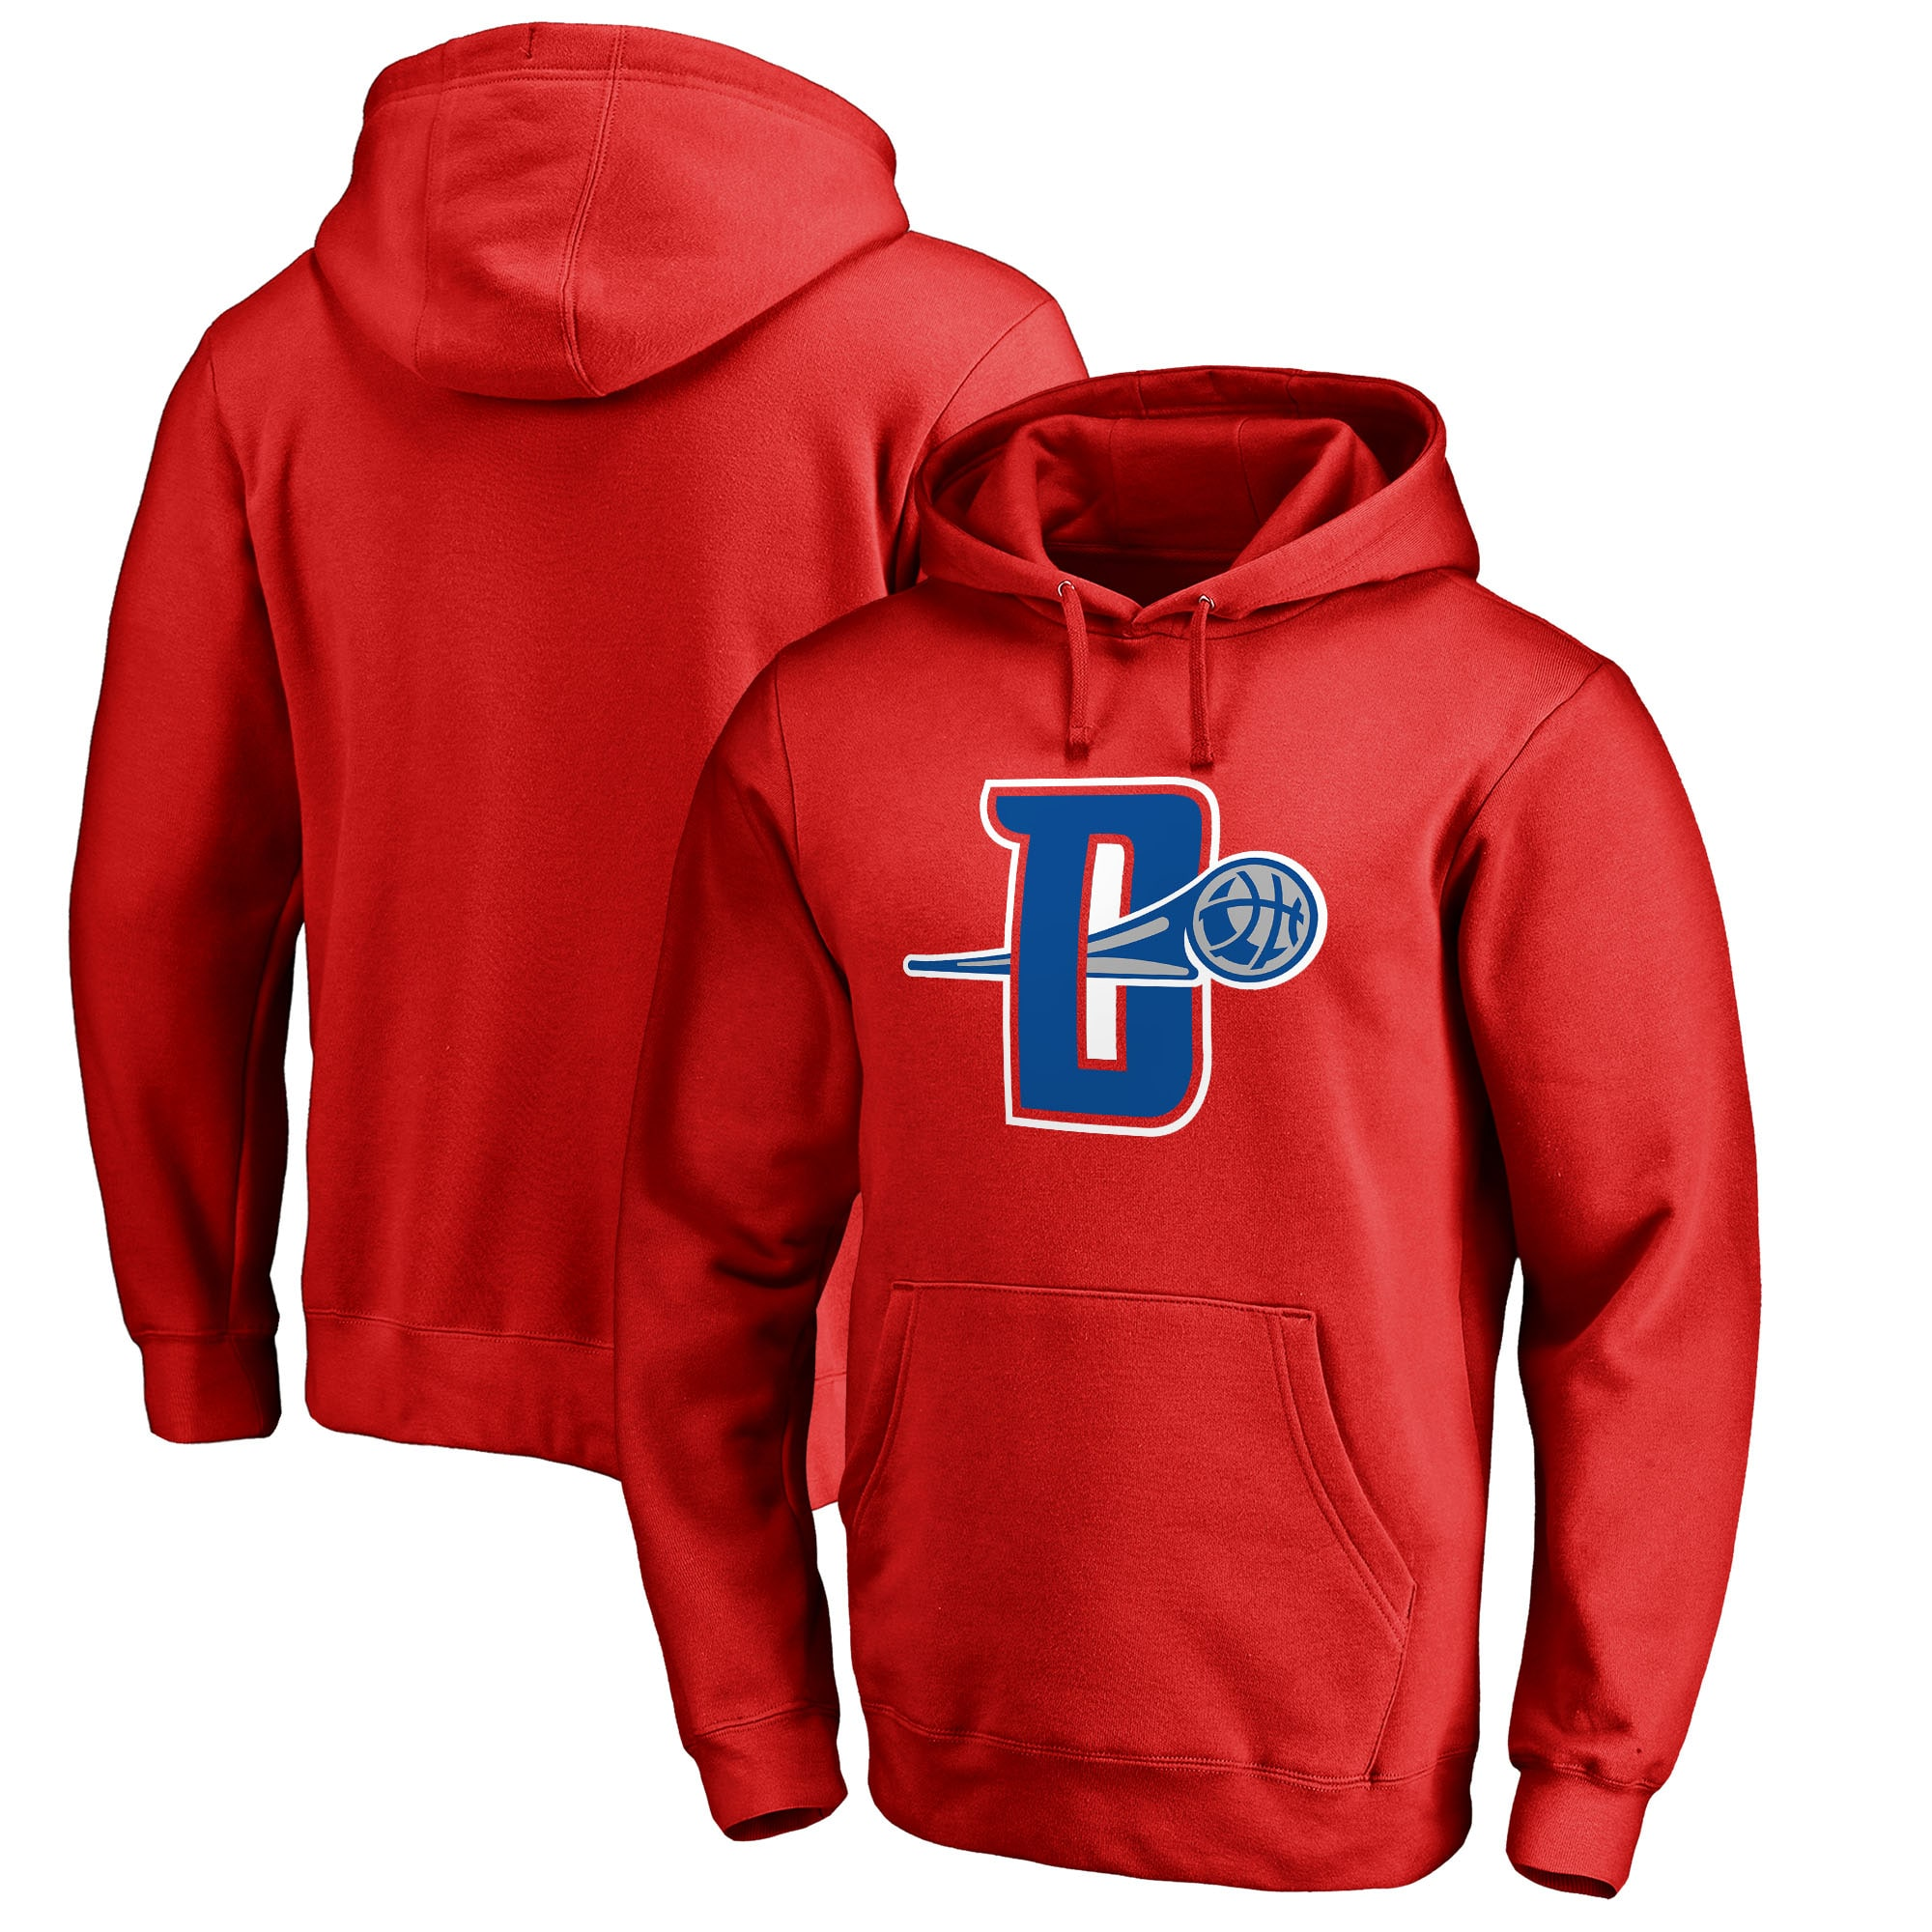 Detroit Pistons Fanatics Branded Alternate Logo Pullover Hoodie - Red